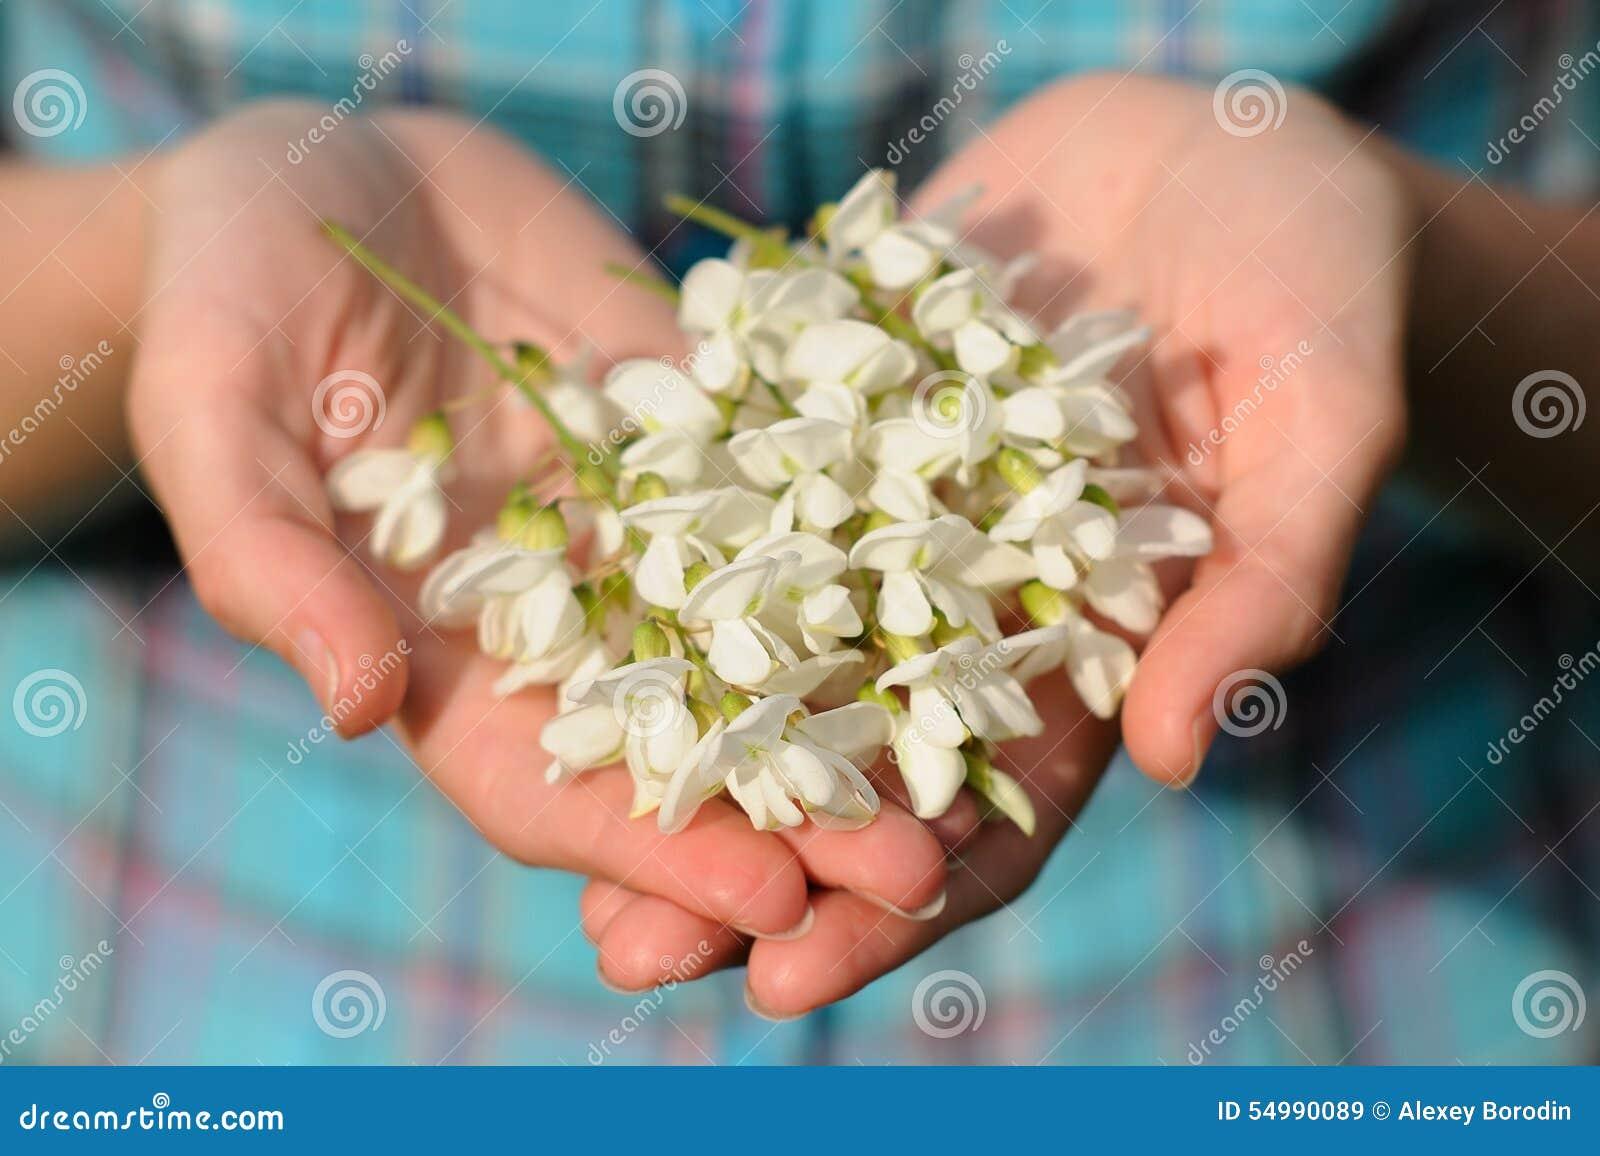 Wild acacia flowers in girl s hands